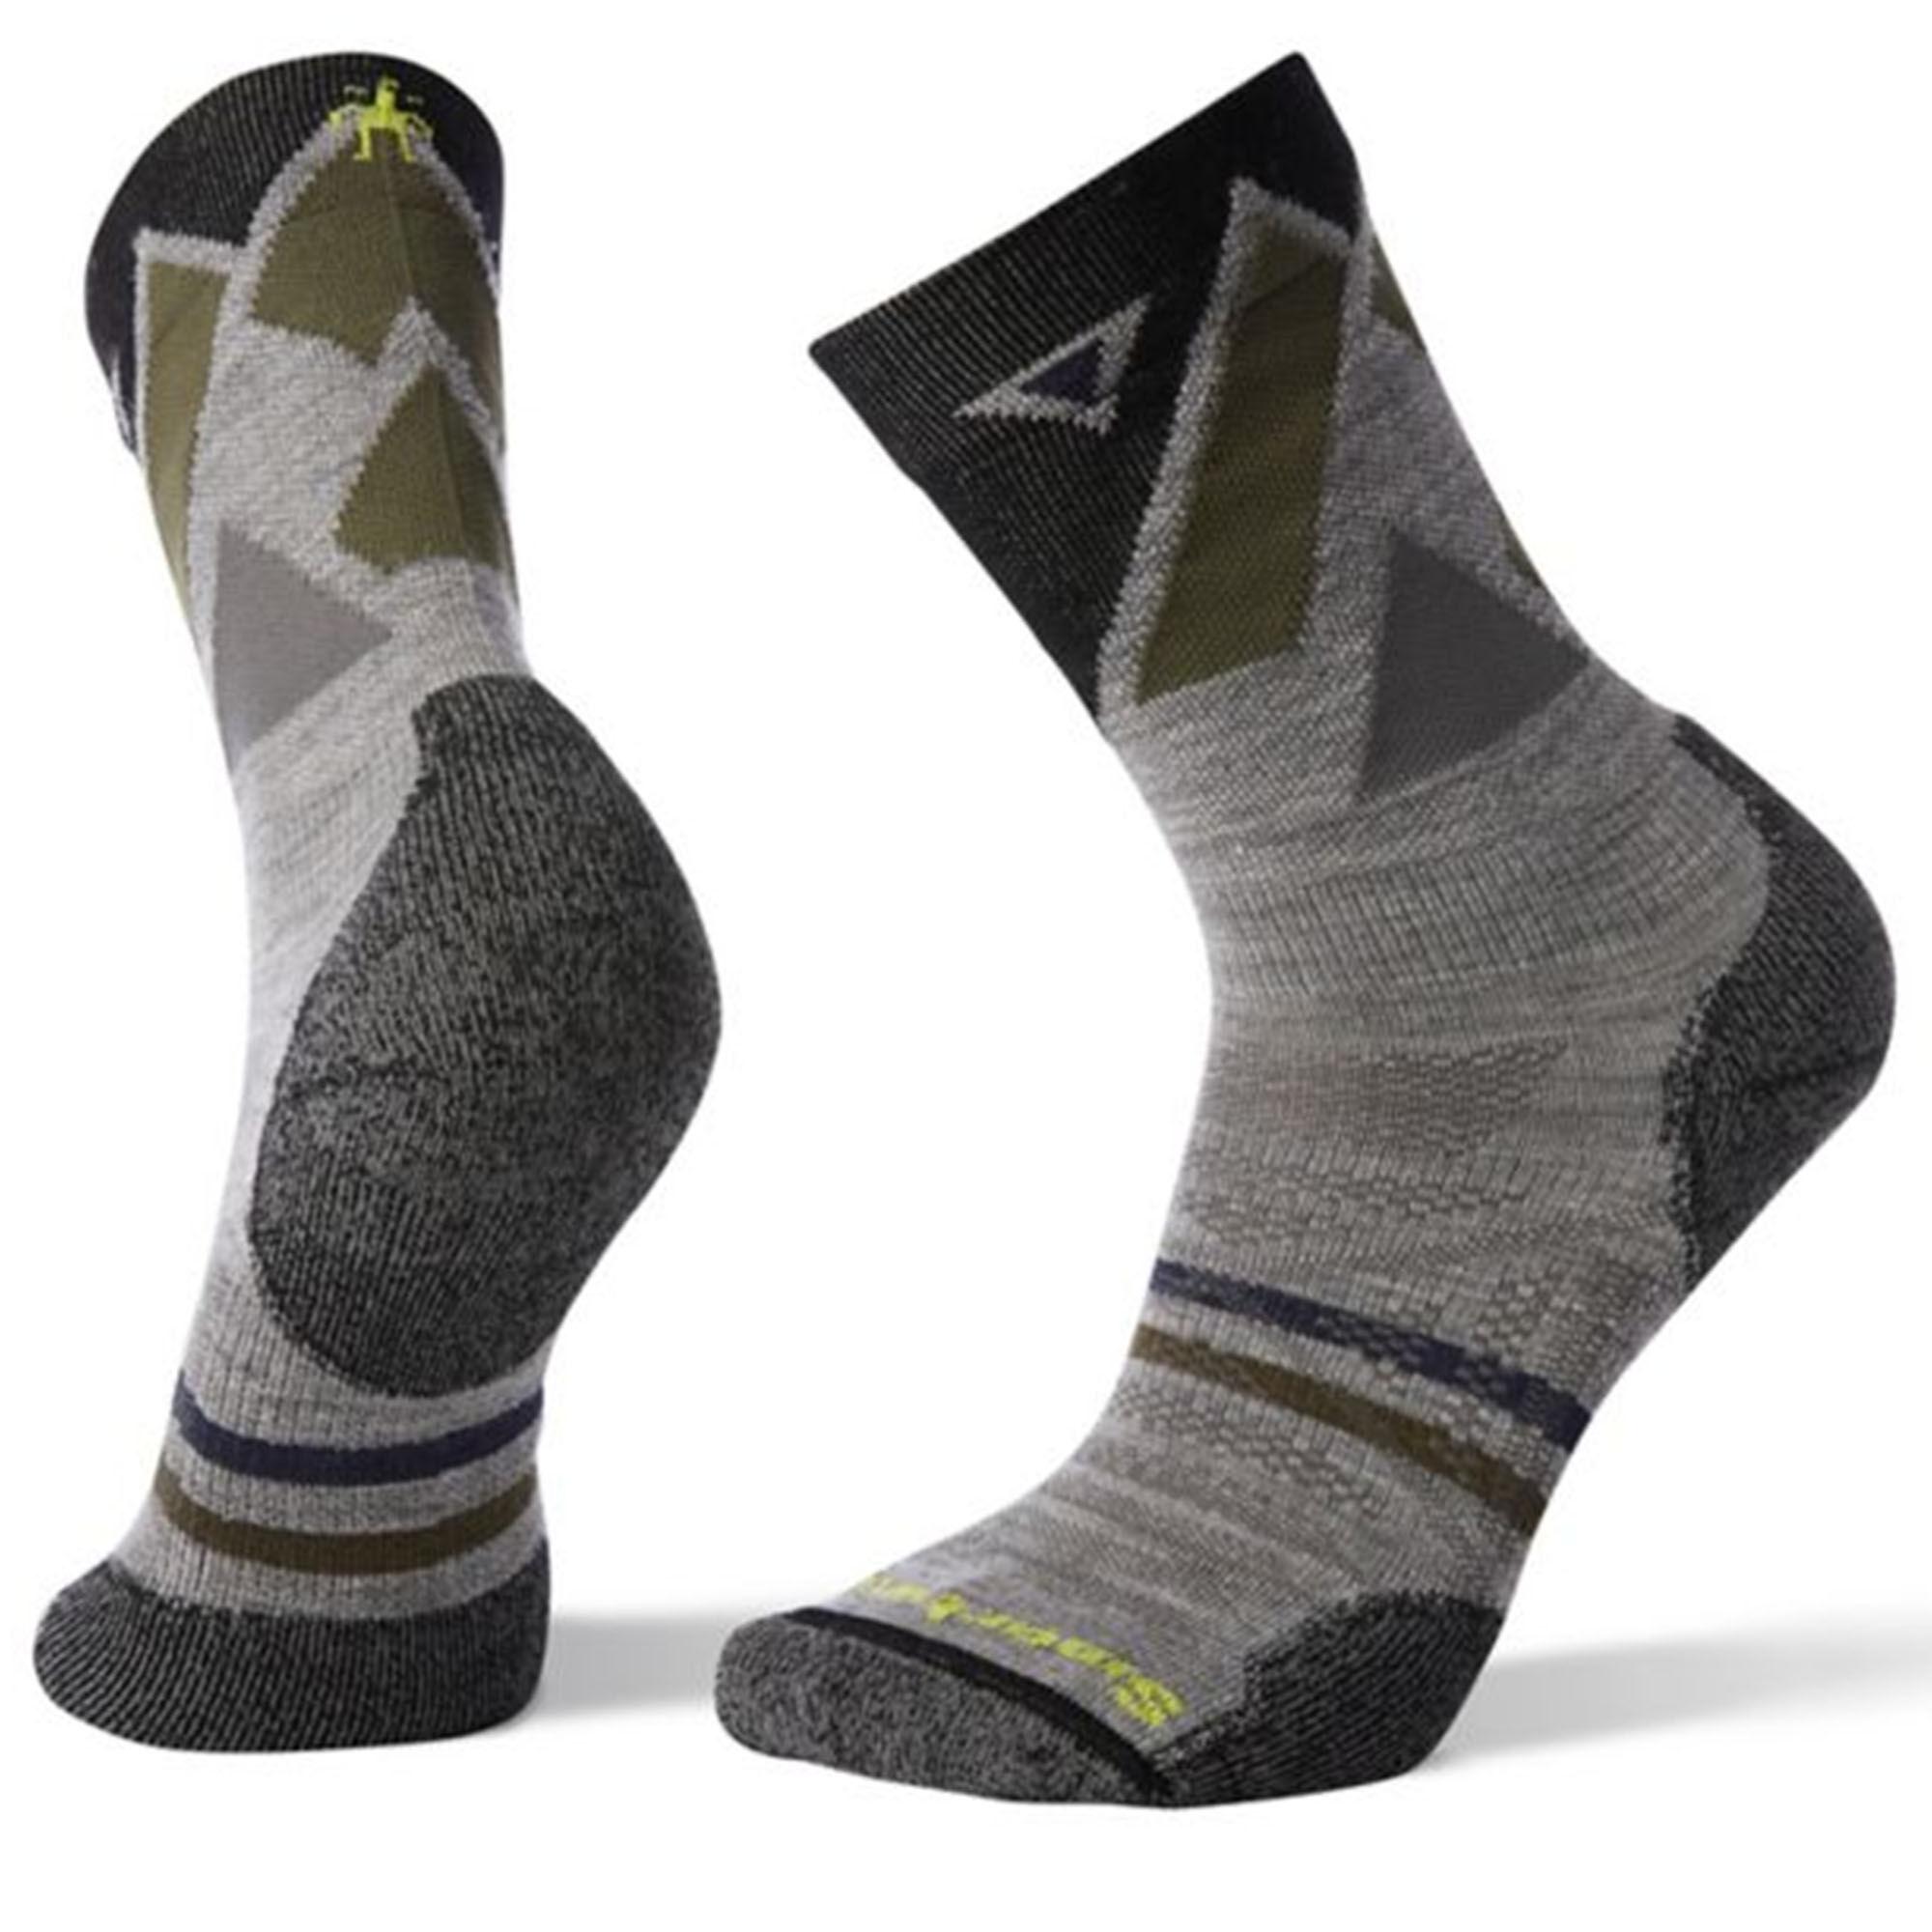 Smartwool Men's Outdoor Light Pattern Crew Socks  - Light Gray - Size: Large